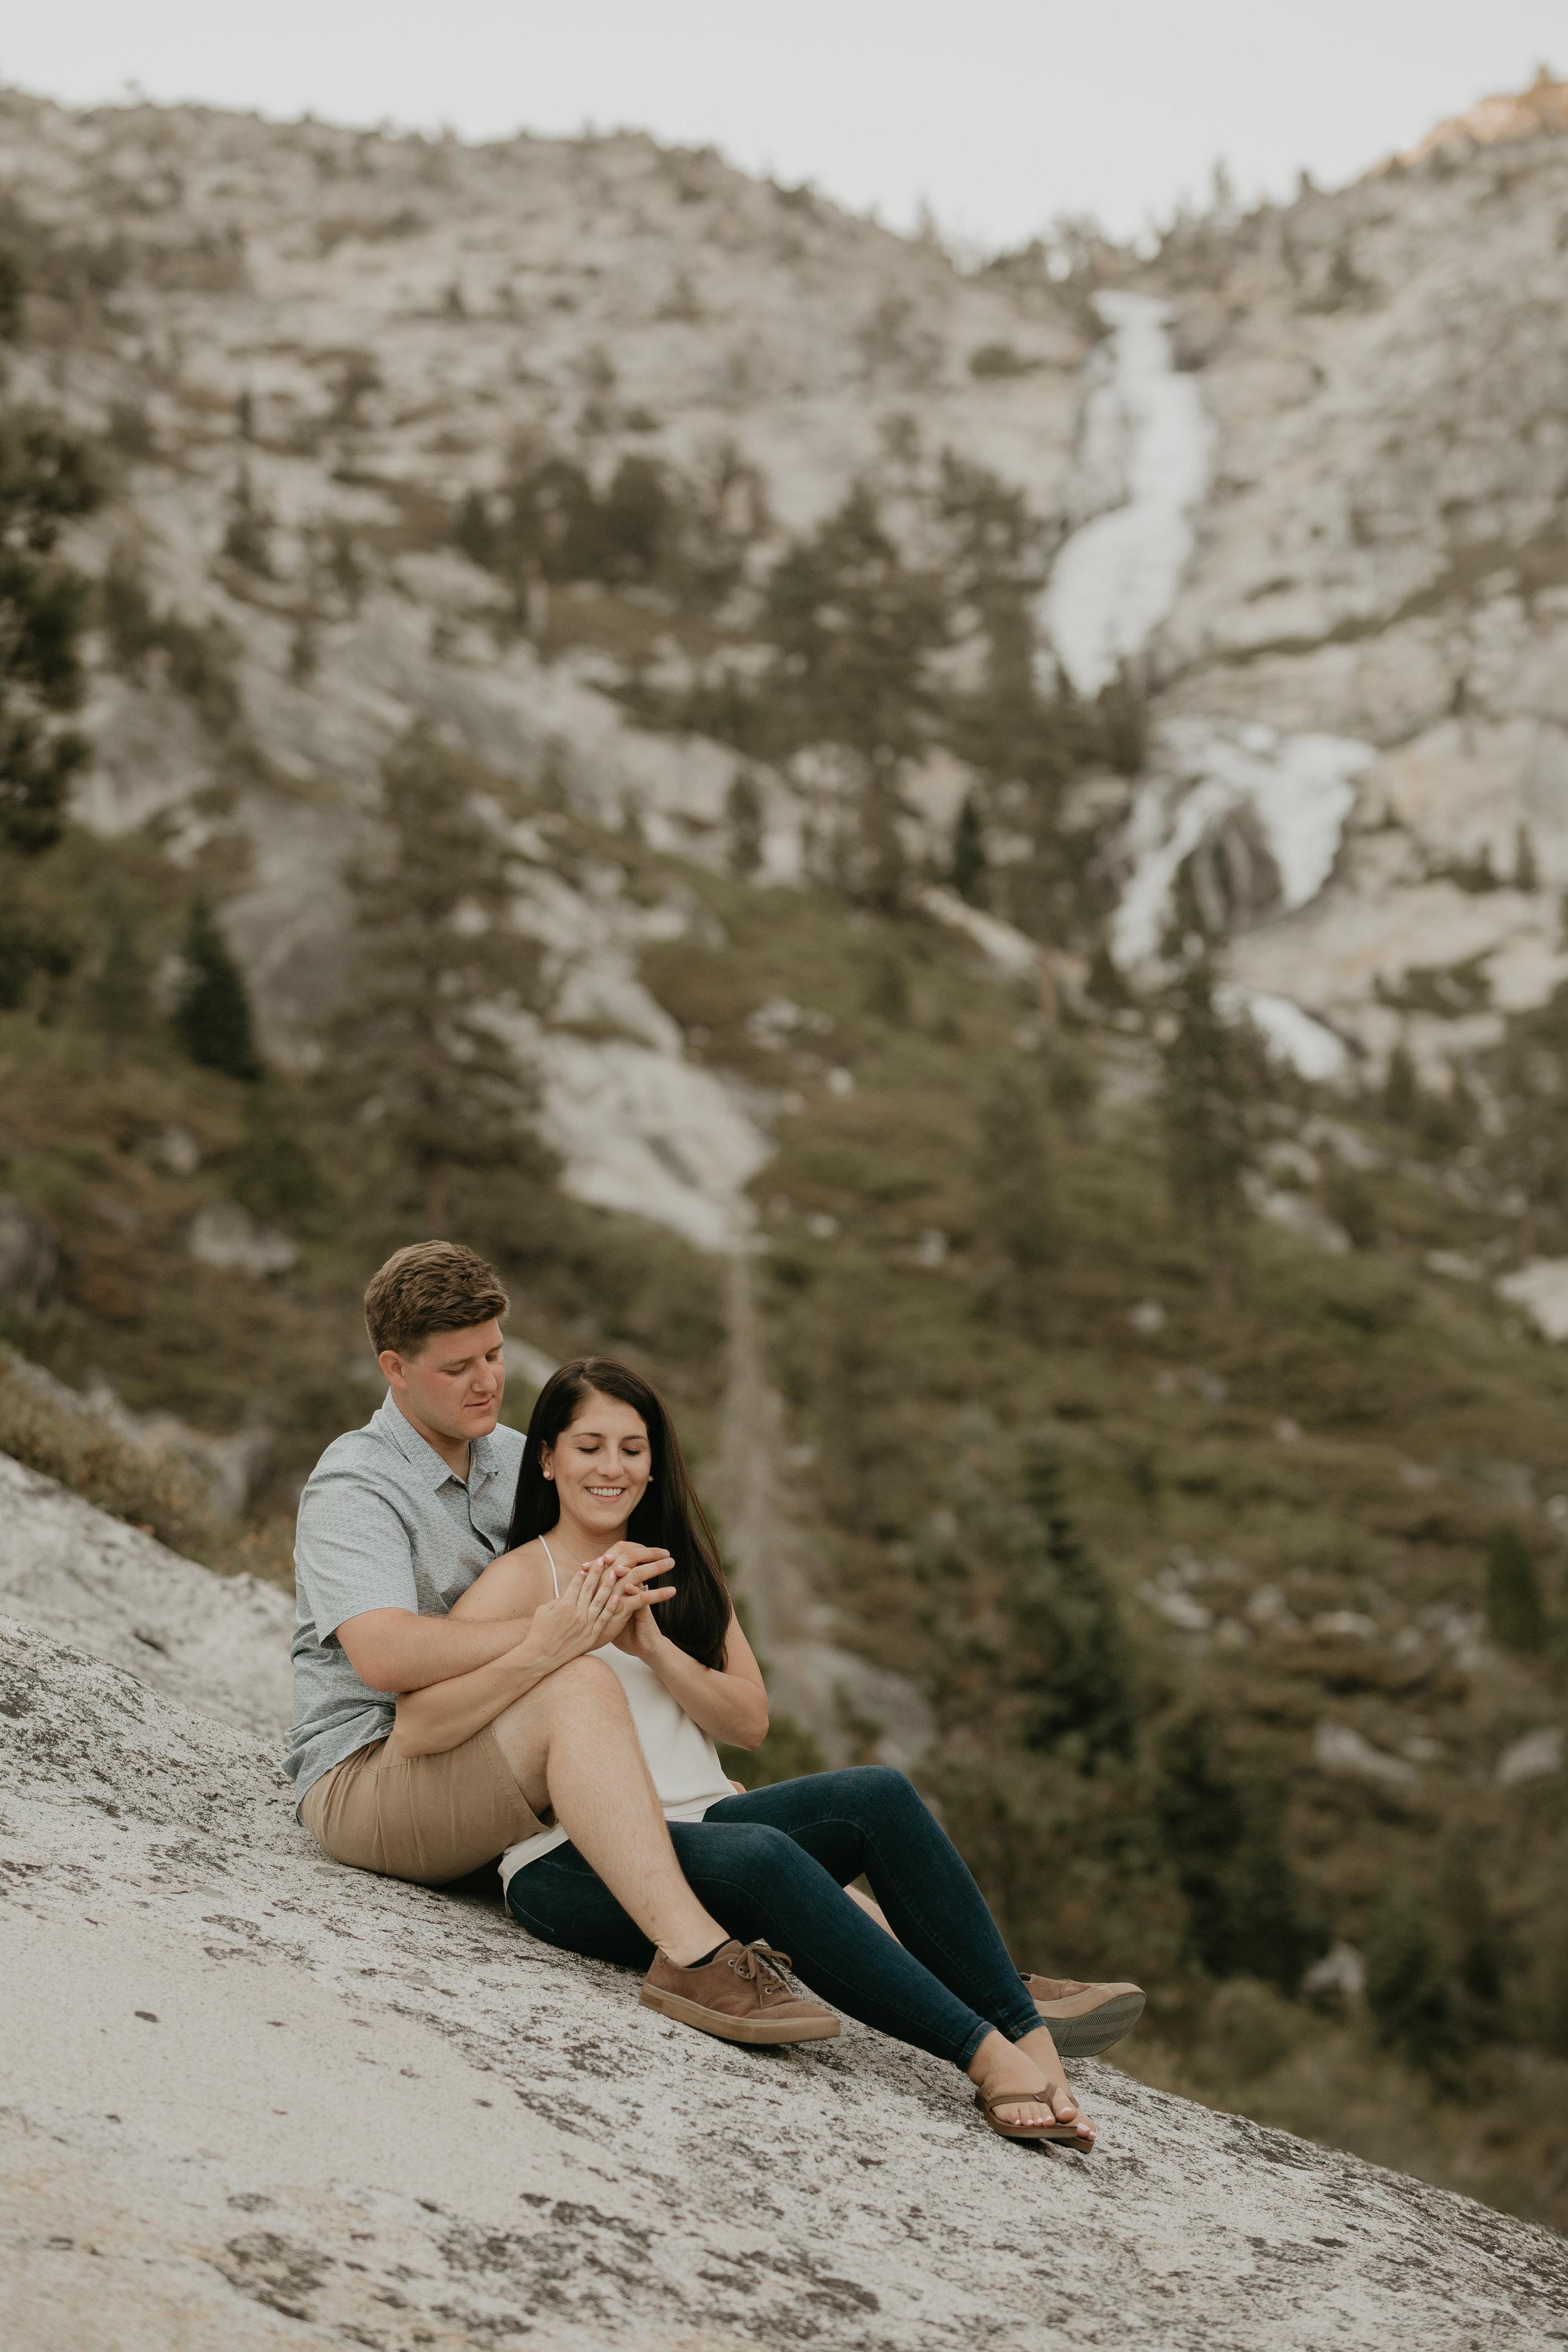 nicole-daacke-photography-fun-adventure-session-waterfall-lake-tahoe-sunset-destination-wedding-photographer-northern-california-elopement-photographer-4.jpg